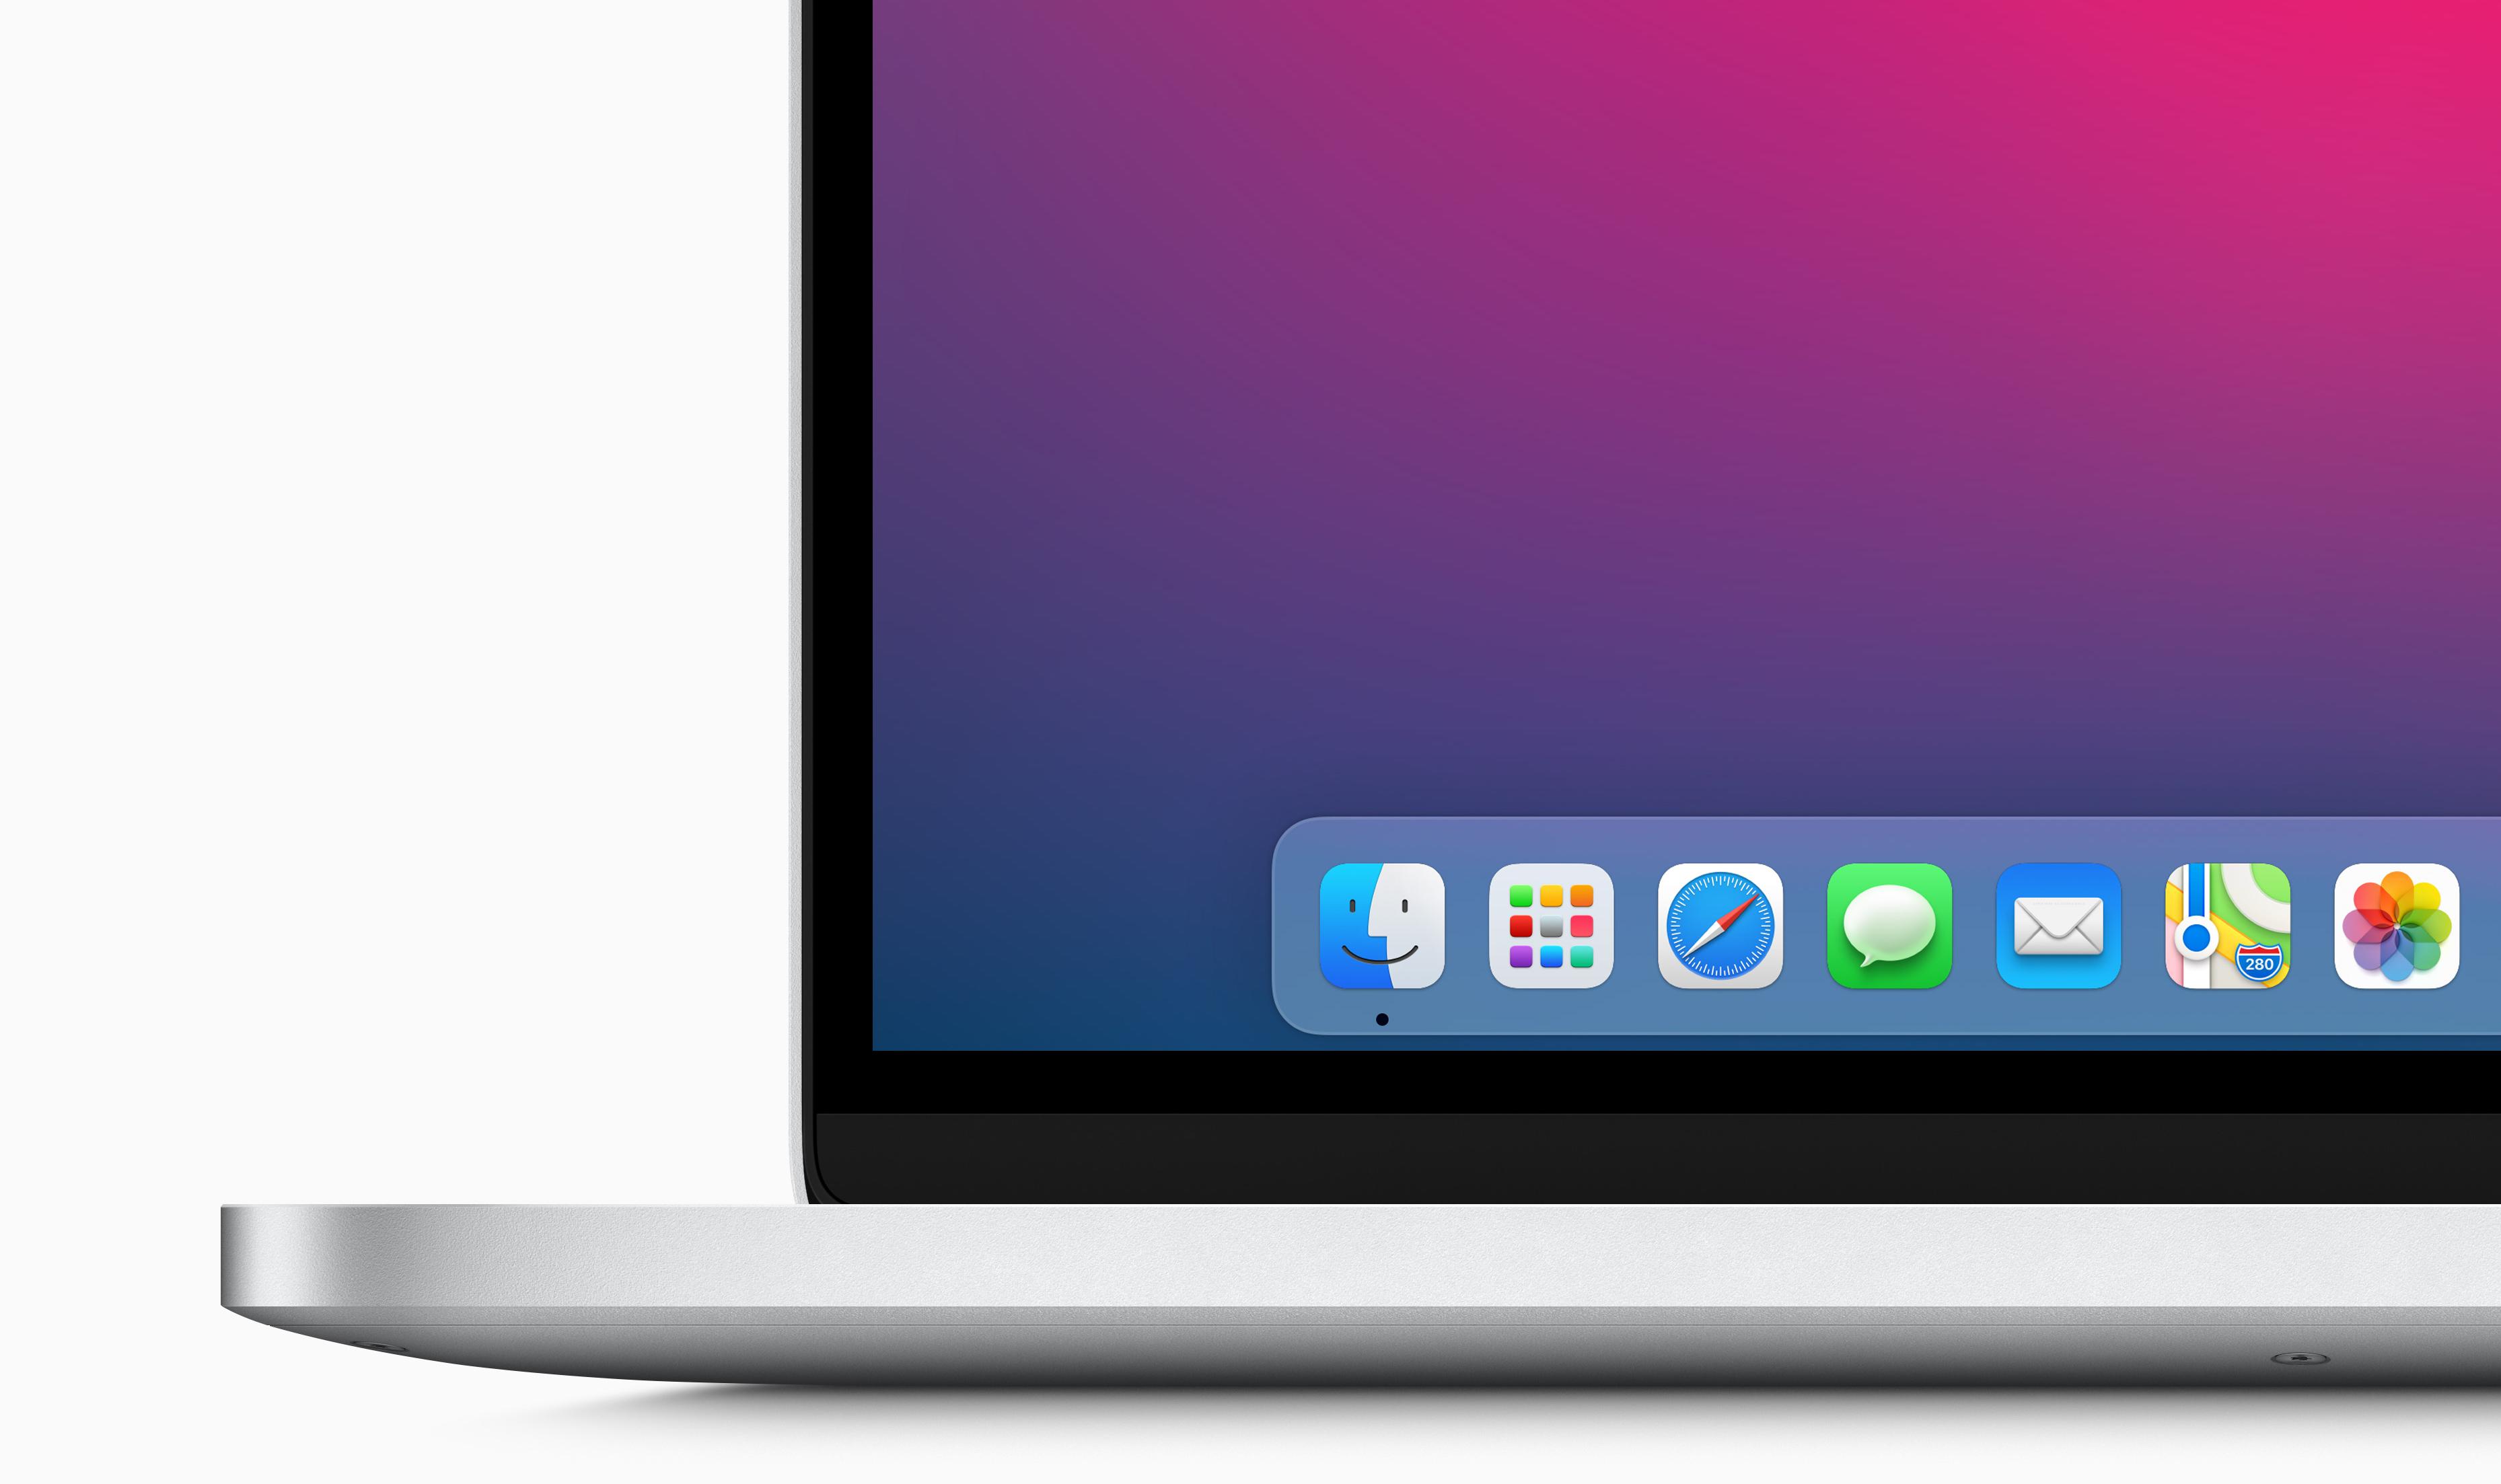 Purple Note App For Macs